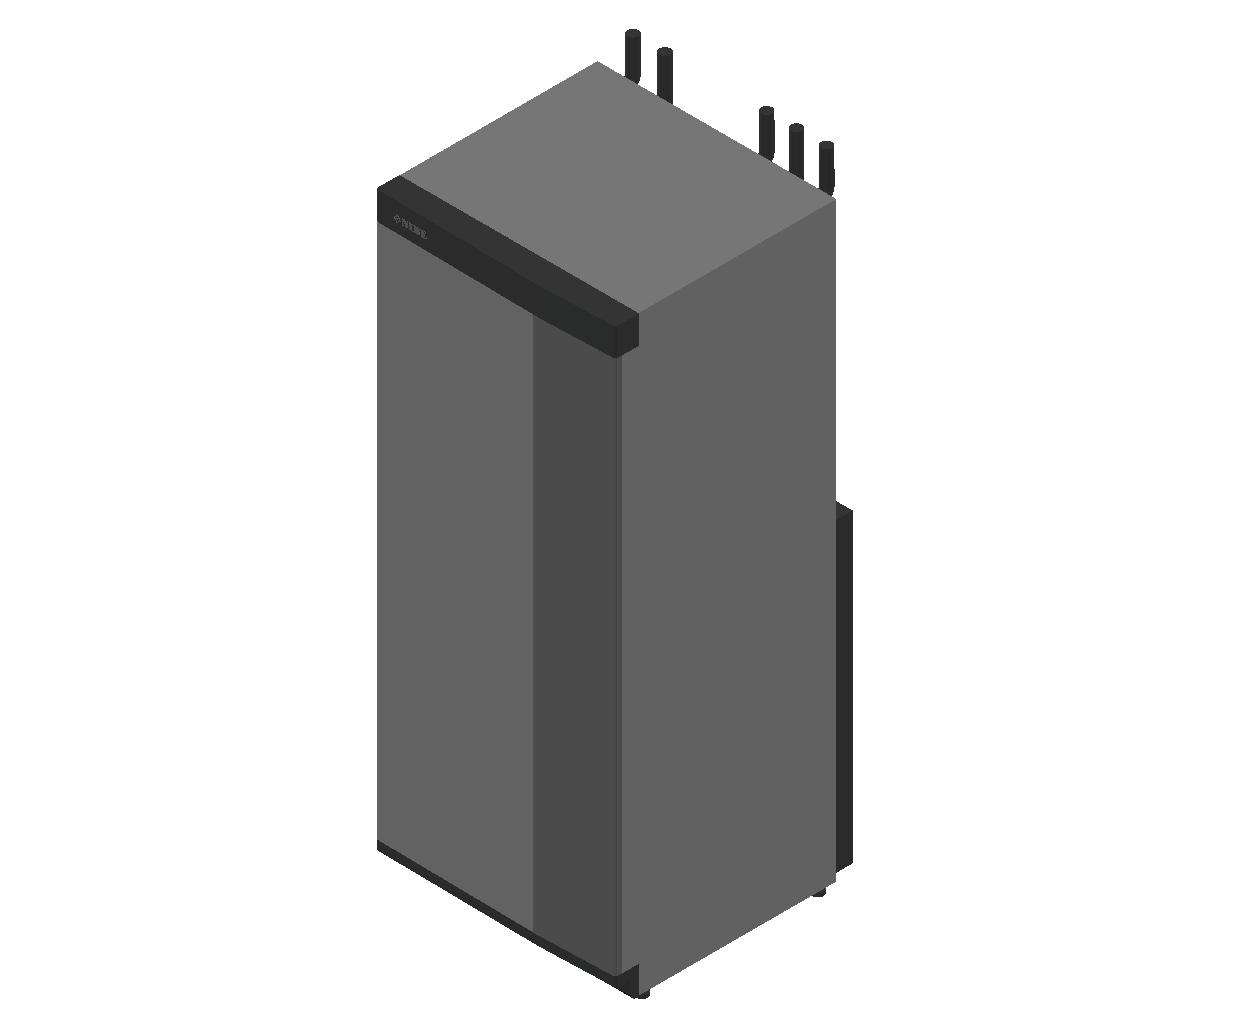 HC_Heat Pump_MEPcontent_NIBE_S1155-25 3x400V_INT-EN.dwg